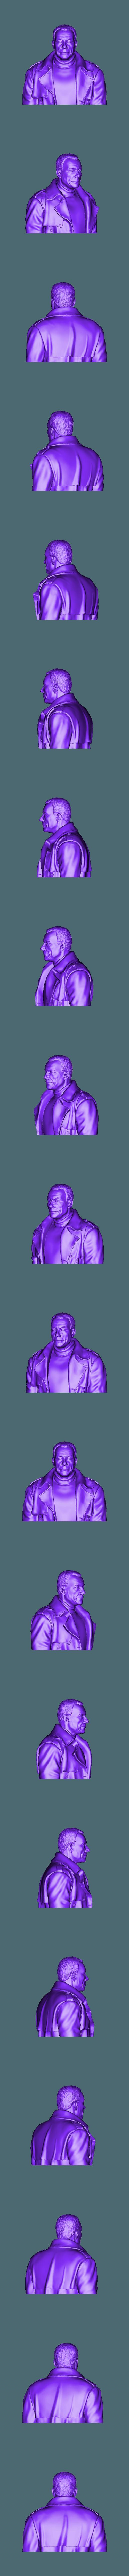 Vilain_02.stl Download STL file NAUGHTY JEAN CLAUDE VAN DAMME • 3D printable template, thierry3D